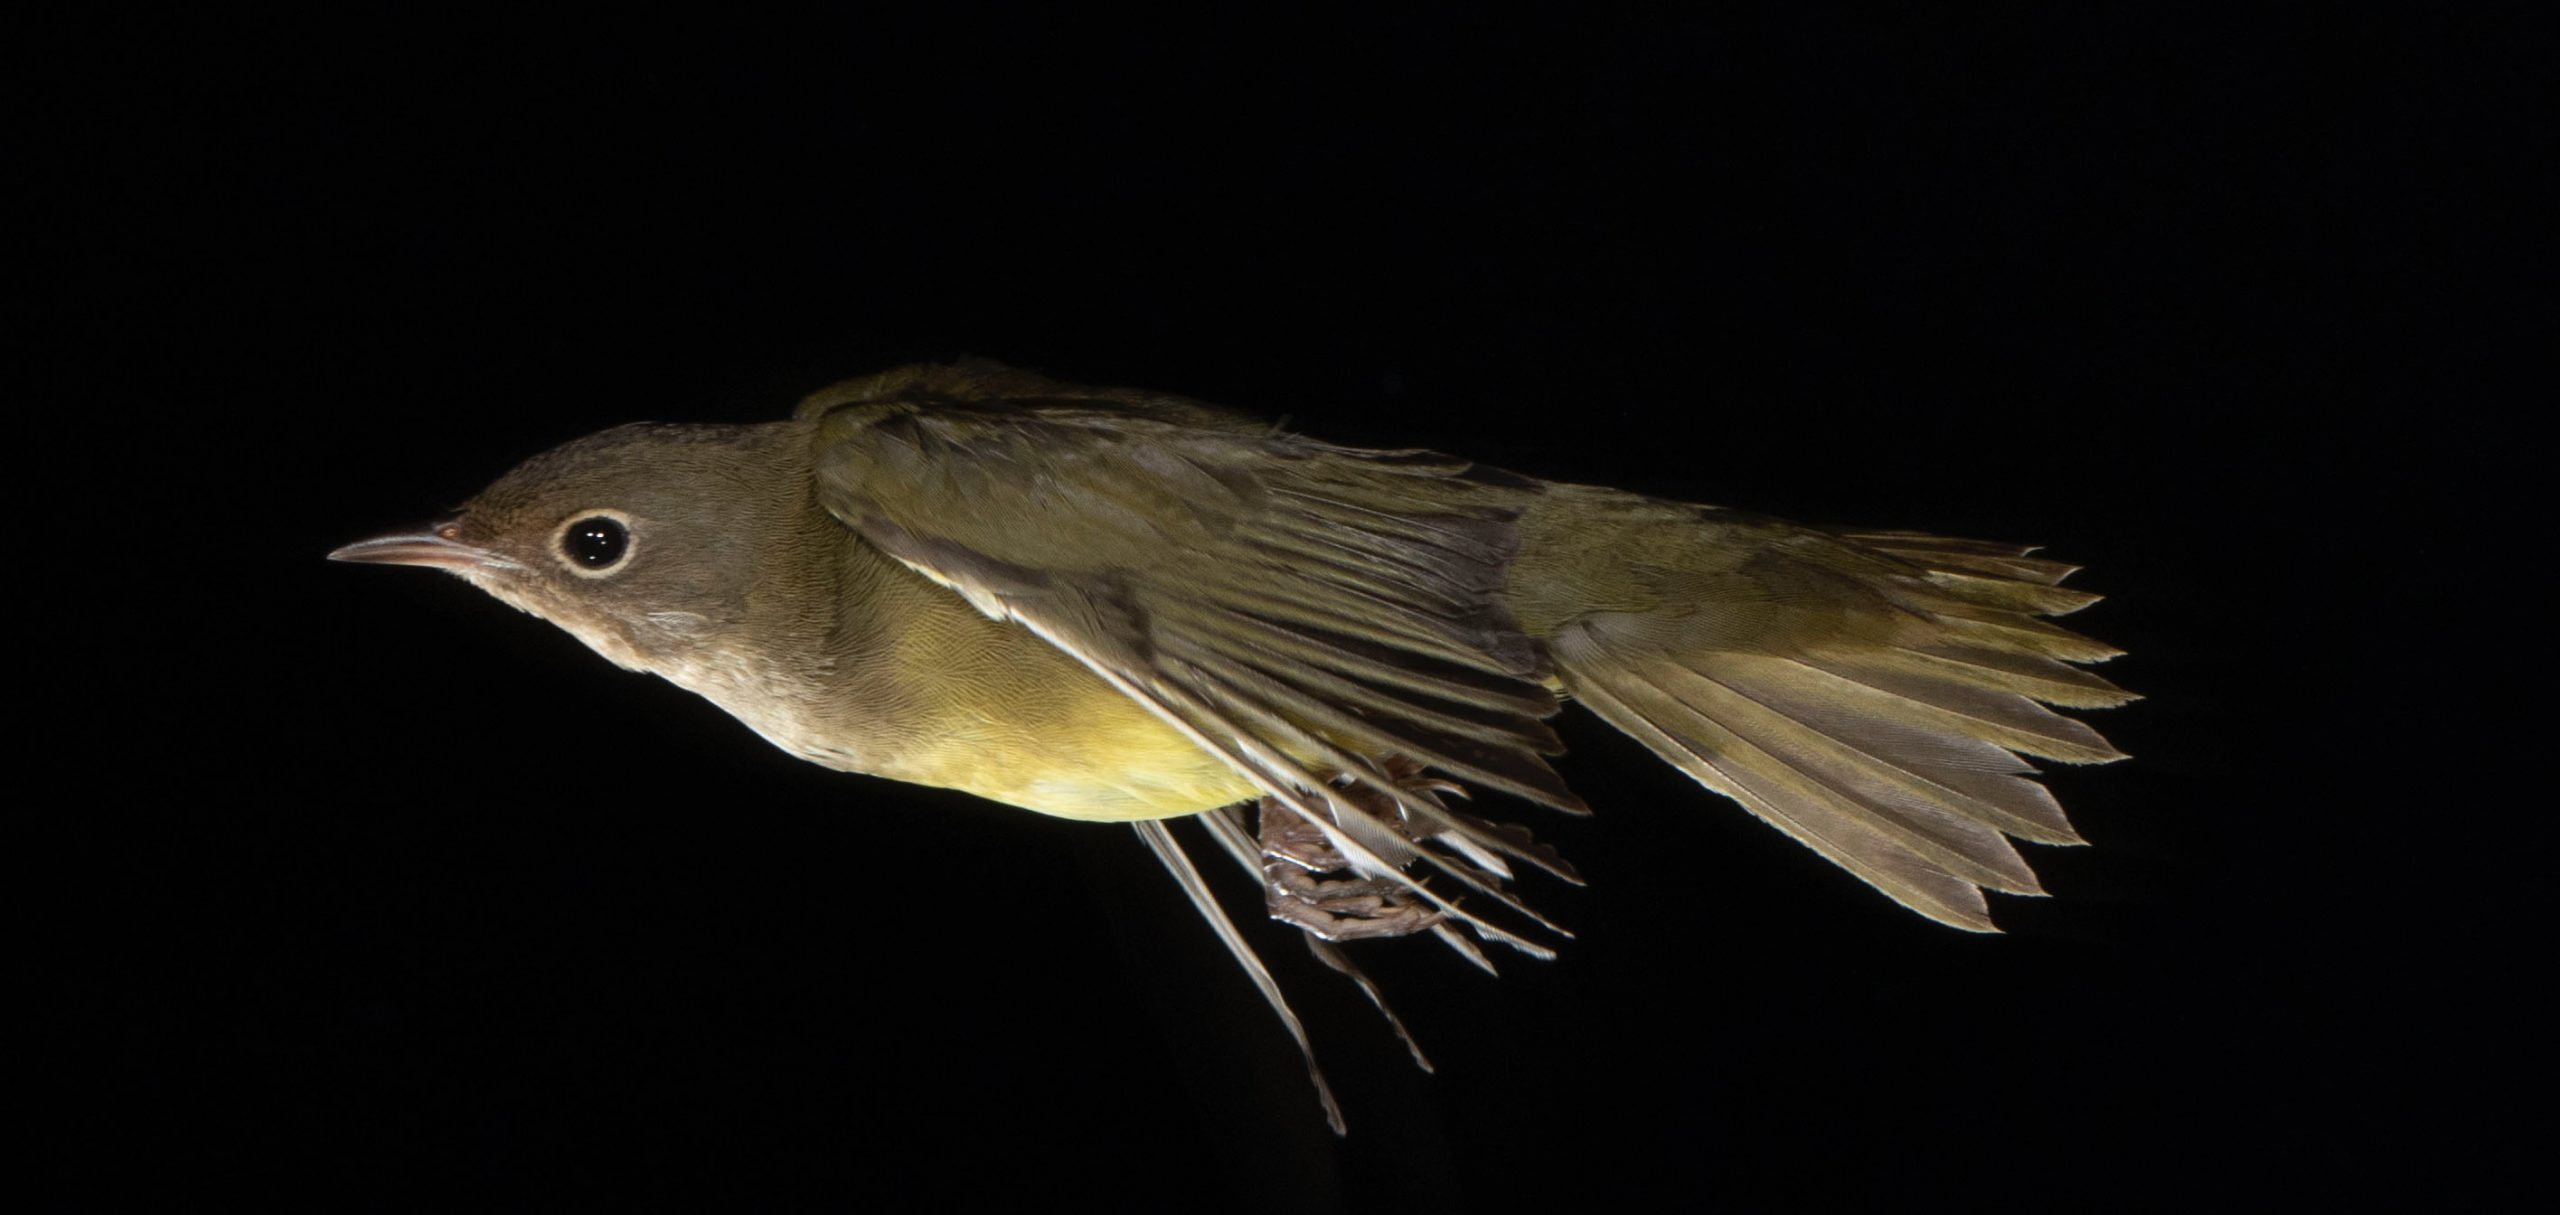 Connecticut Warbler in flight in front of a dark background